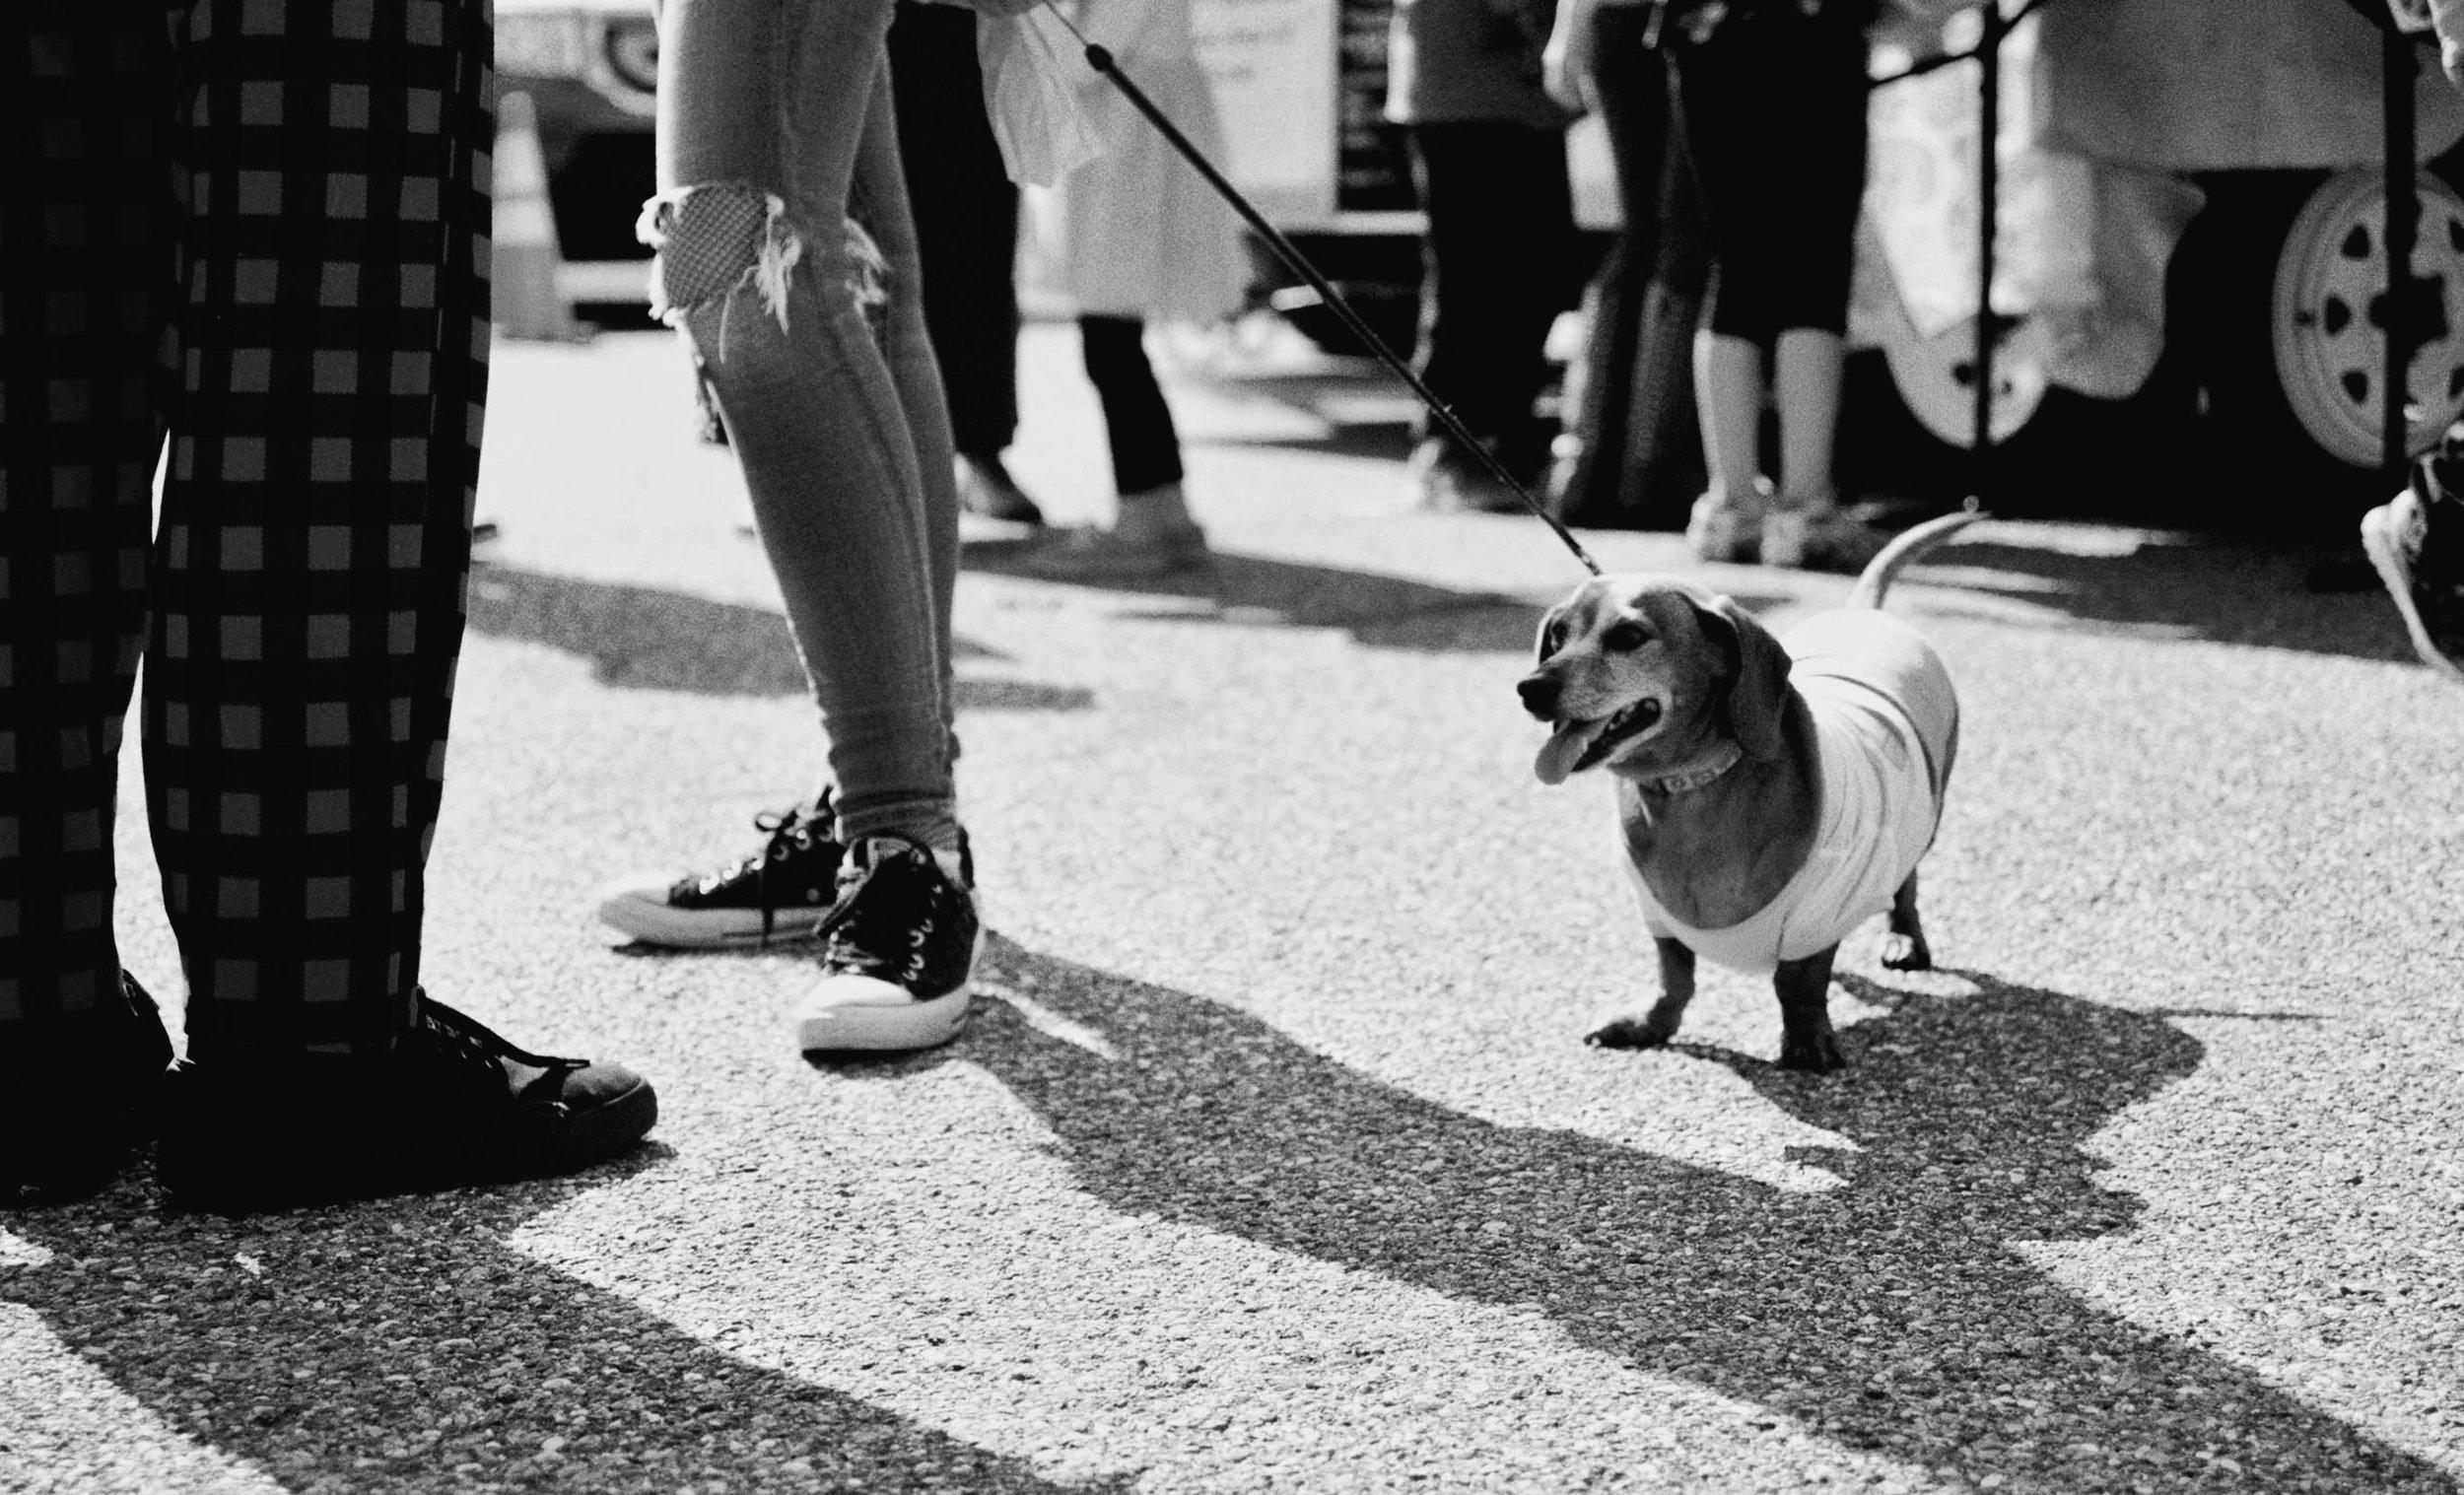 doge-Luis-lopez-photography.jpeg